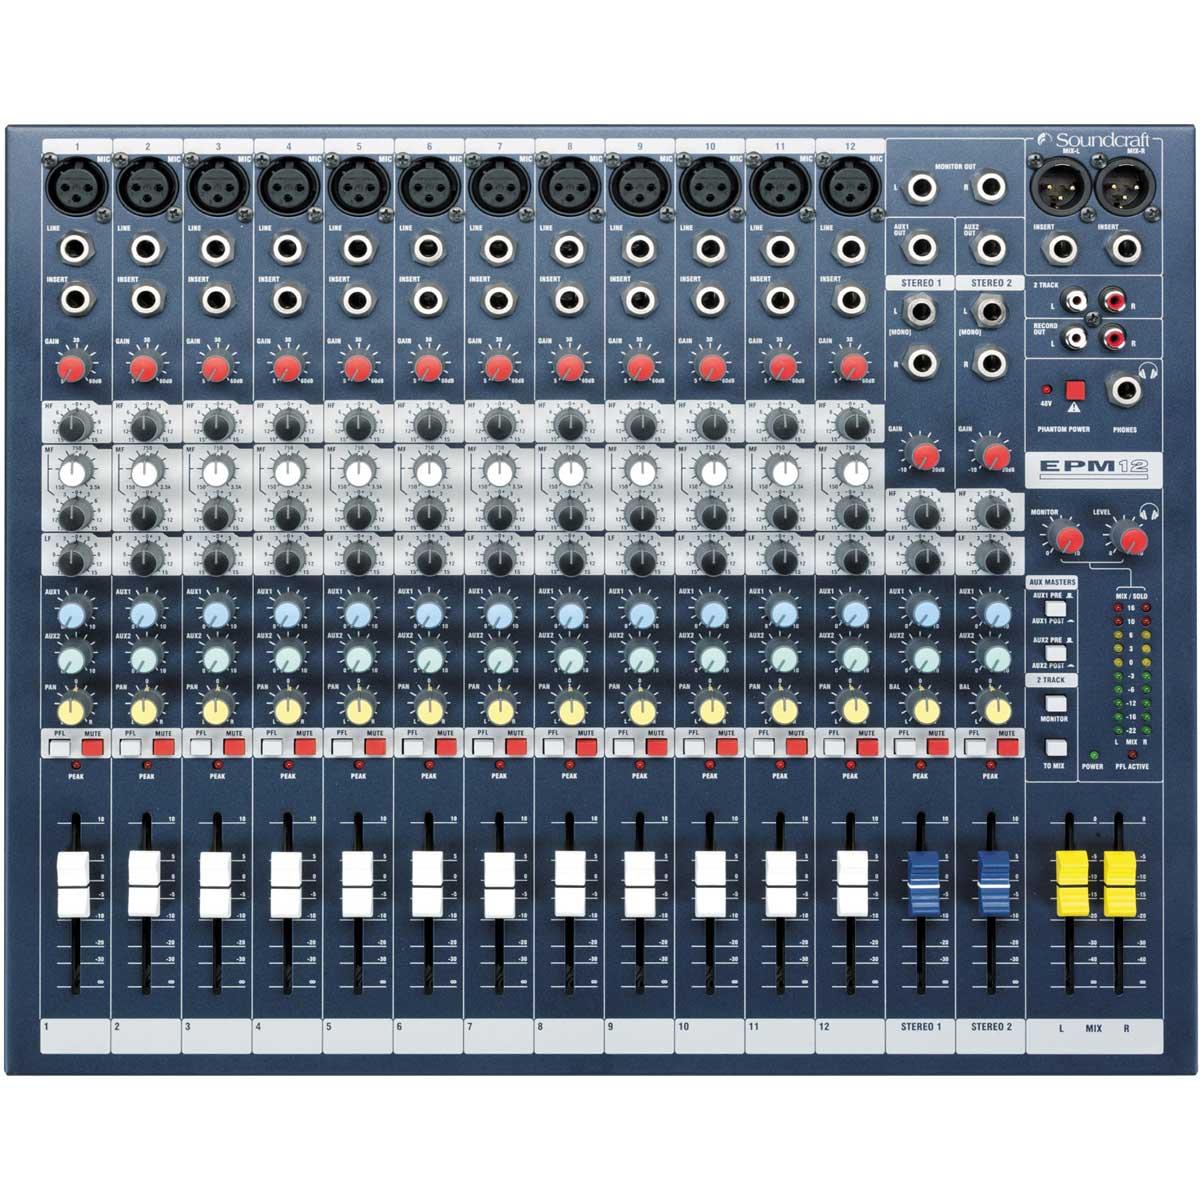 Soundcraft サウンドクラフト / EPM12 アナログミキサー【お取り寄せ商品】